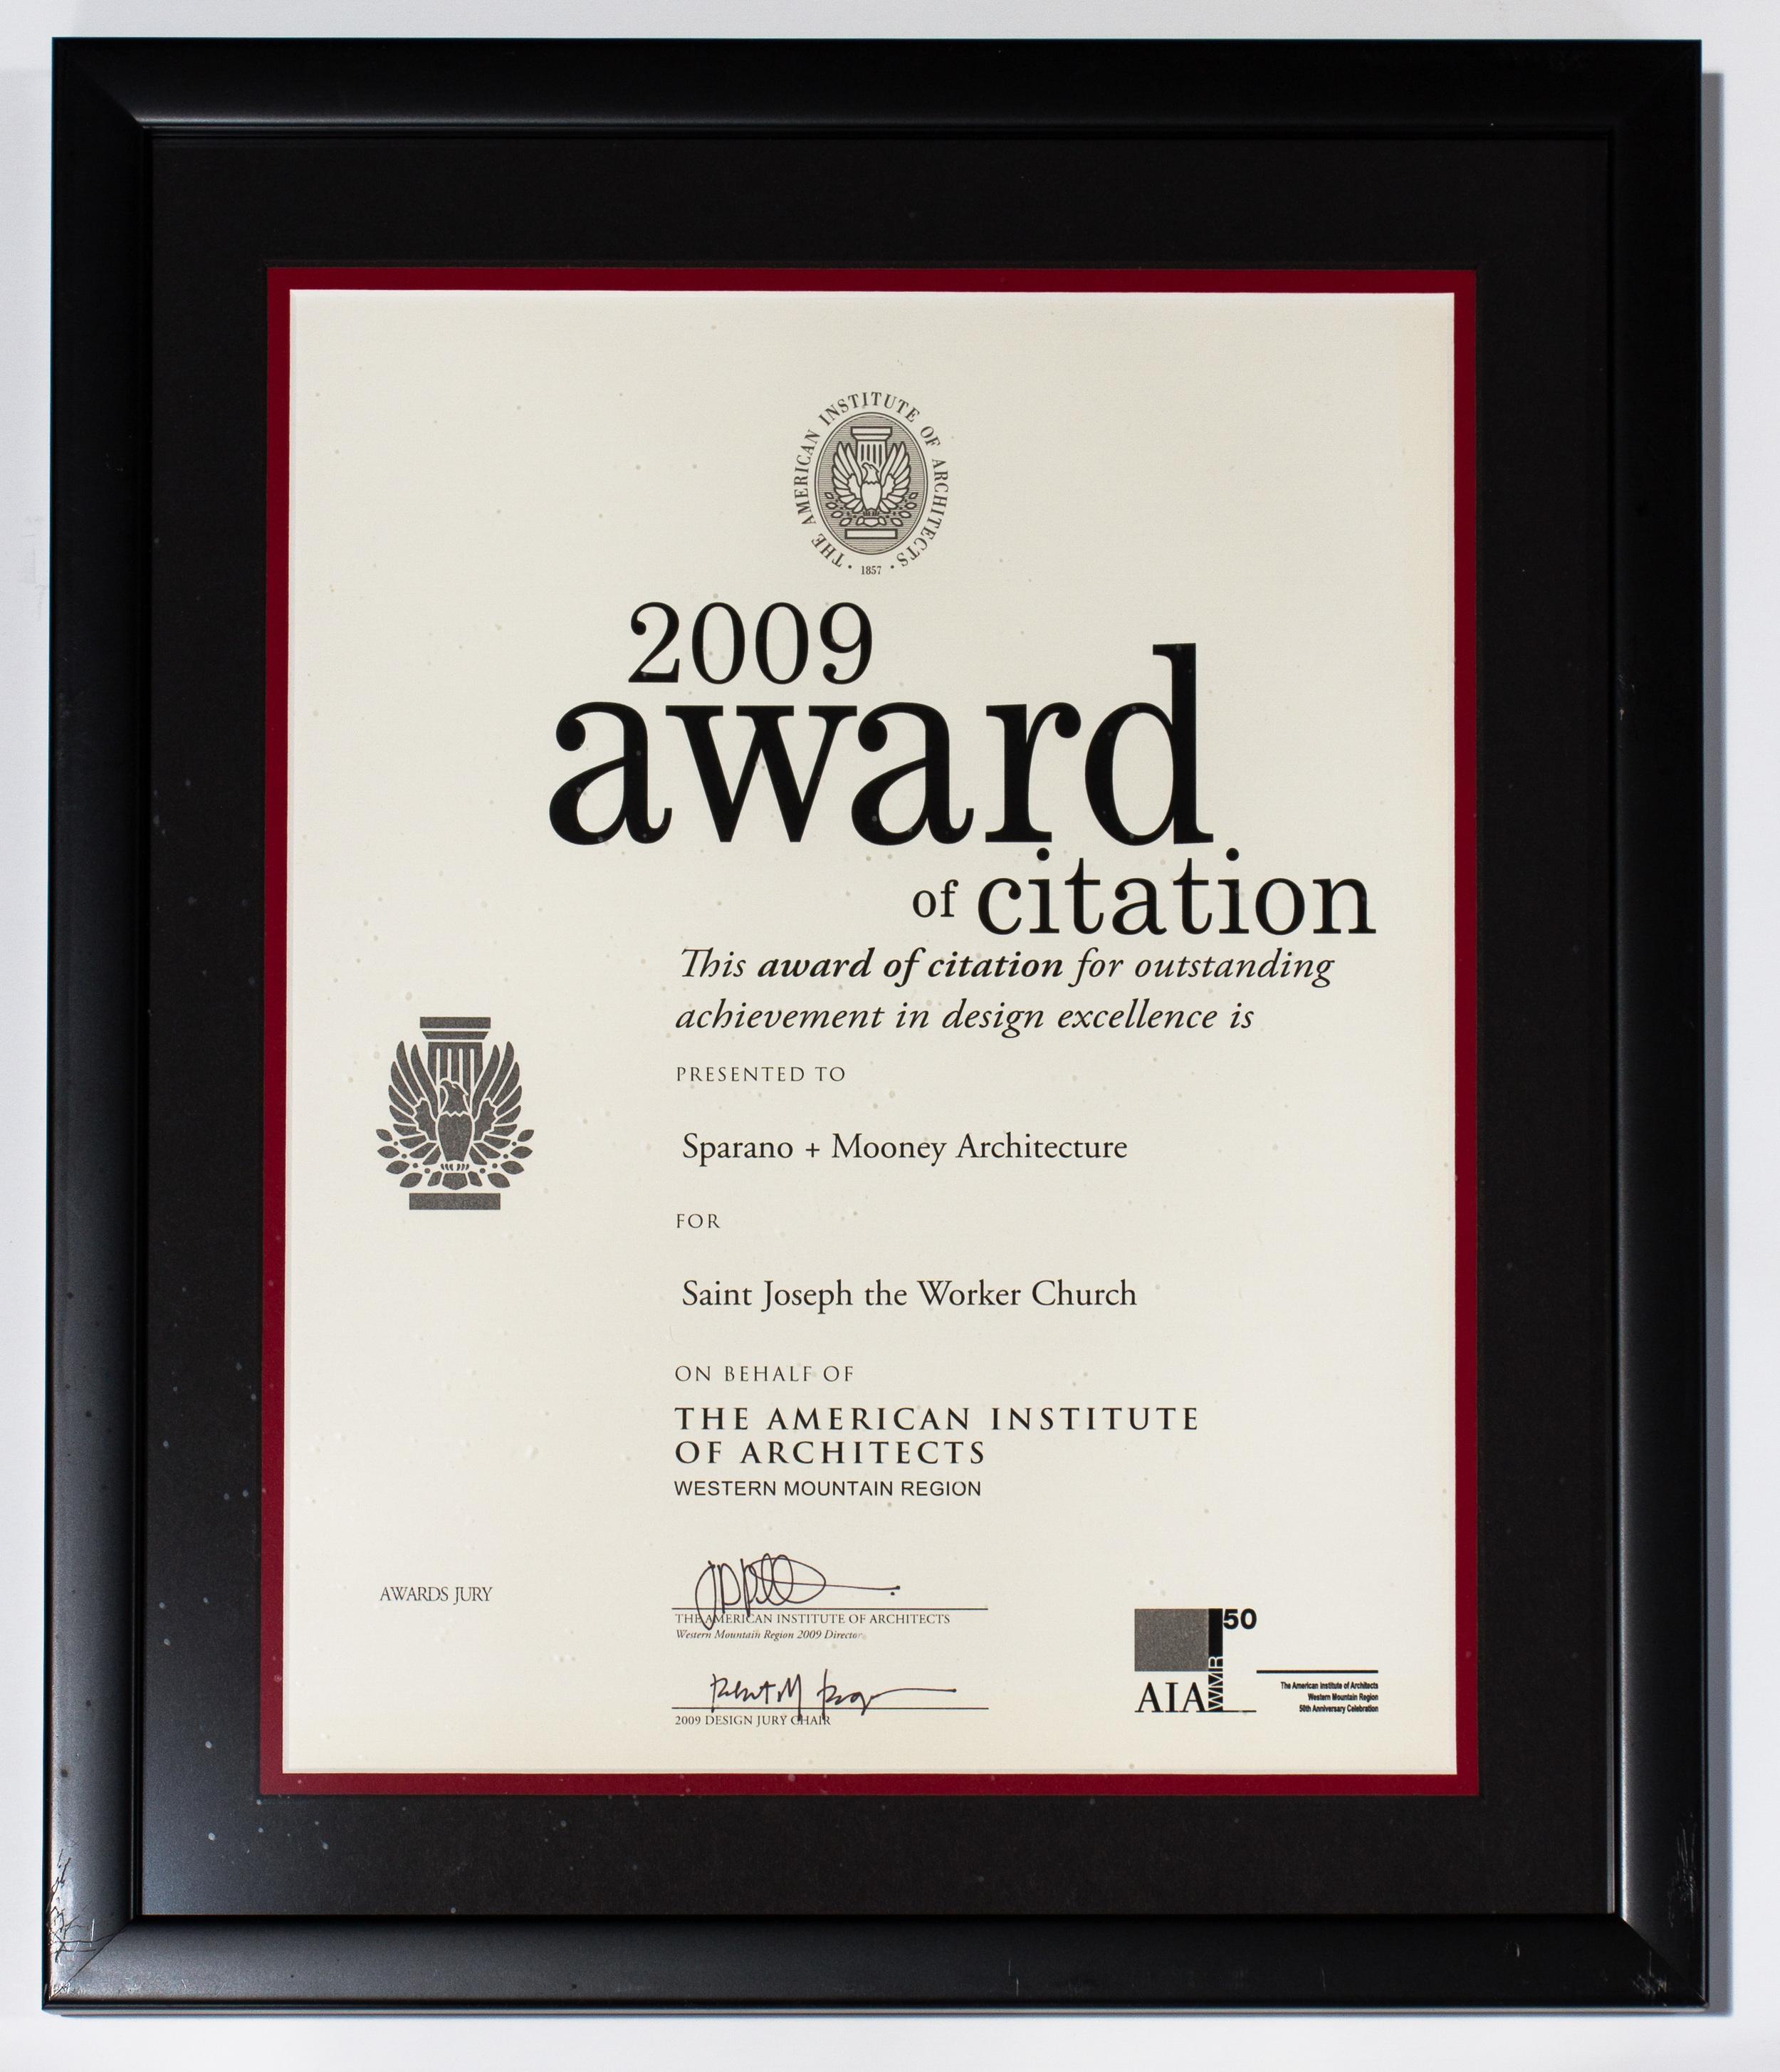 SparanoMooneyArchitecture_Award(05)